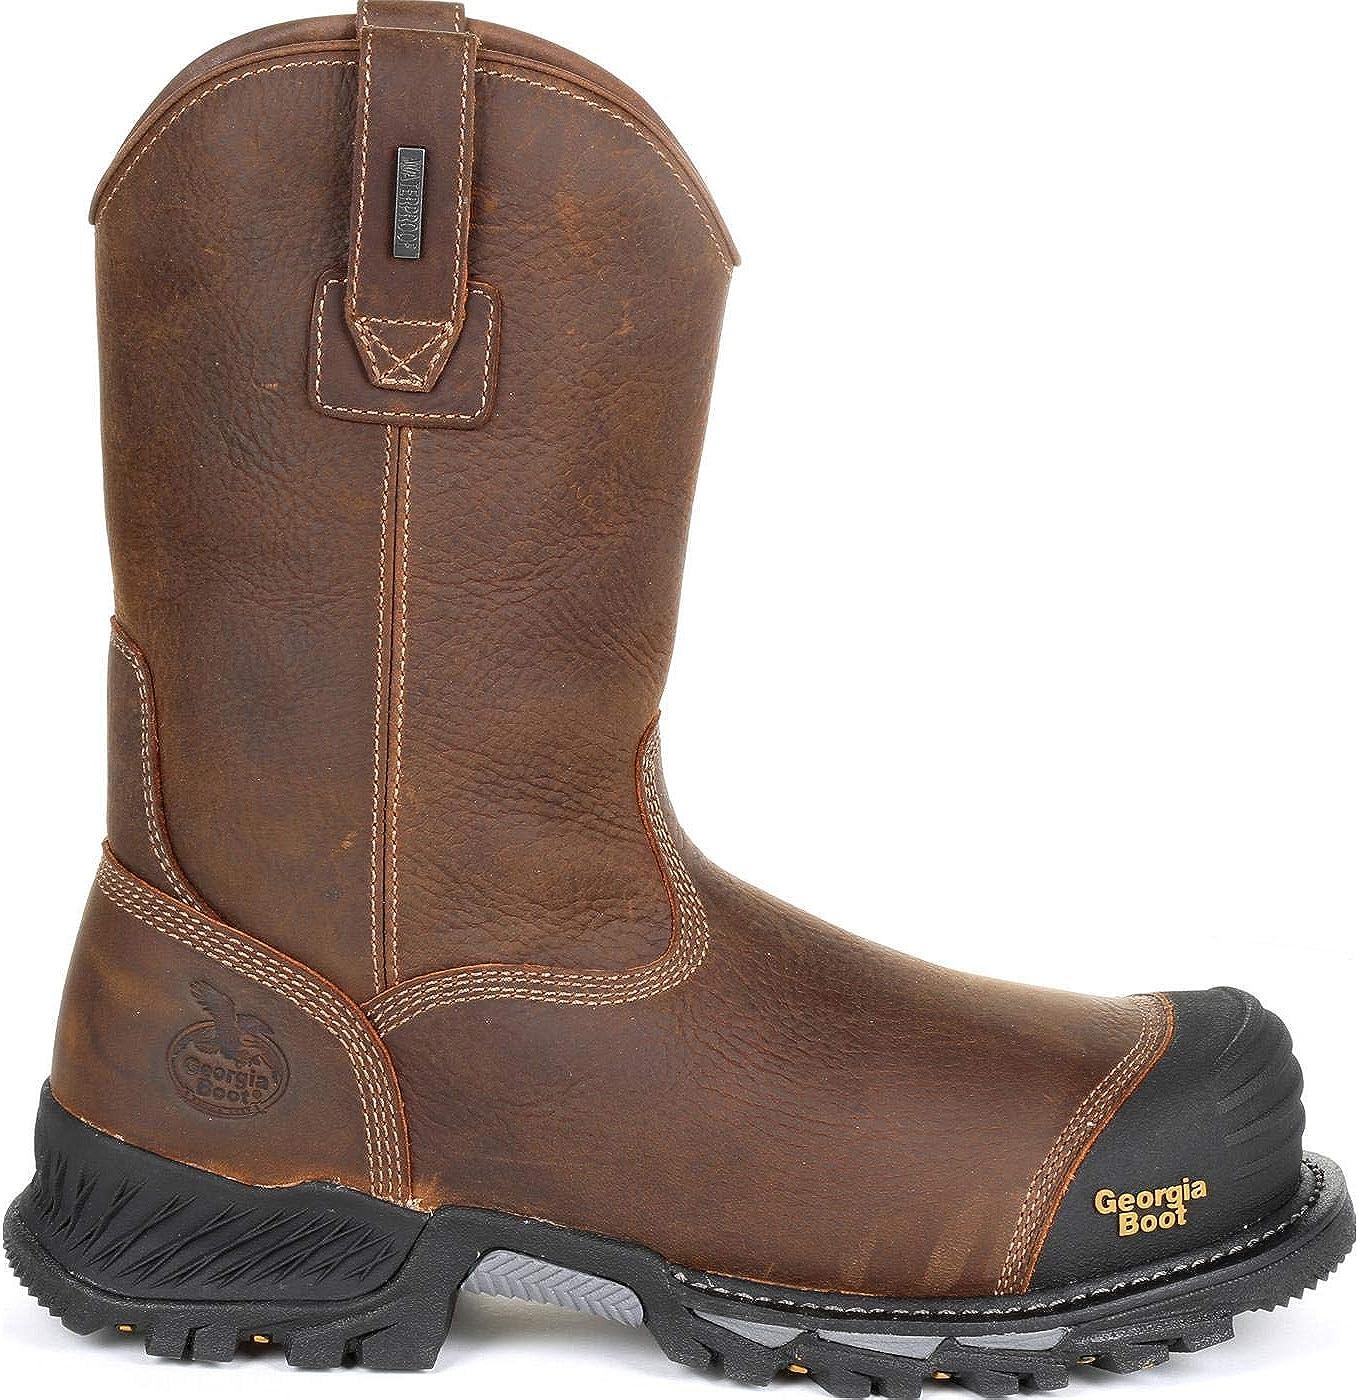 Georgia Boot Mens Rumbler 10 Composite Toe Pull-On